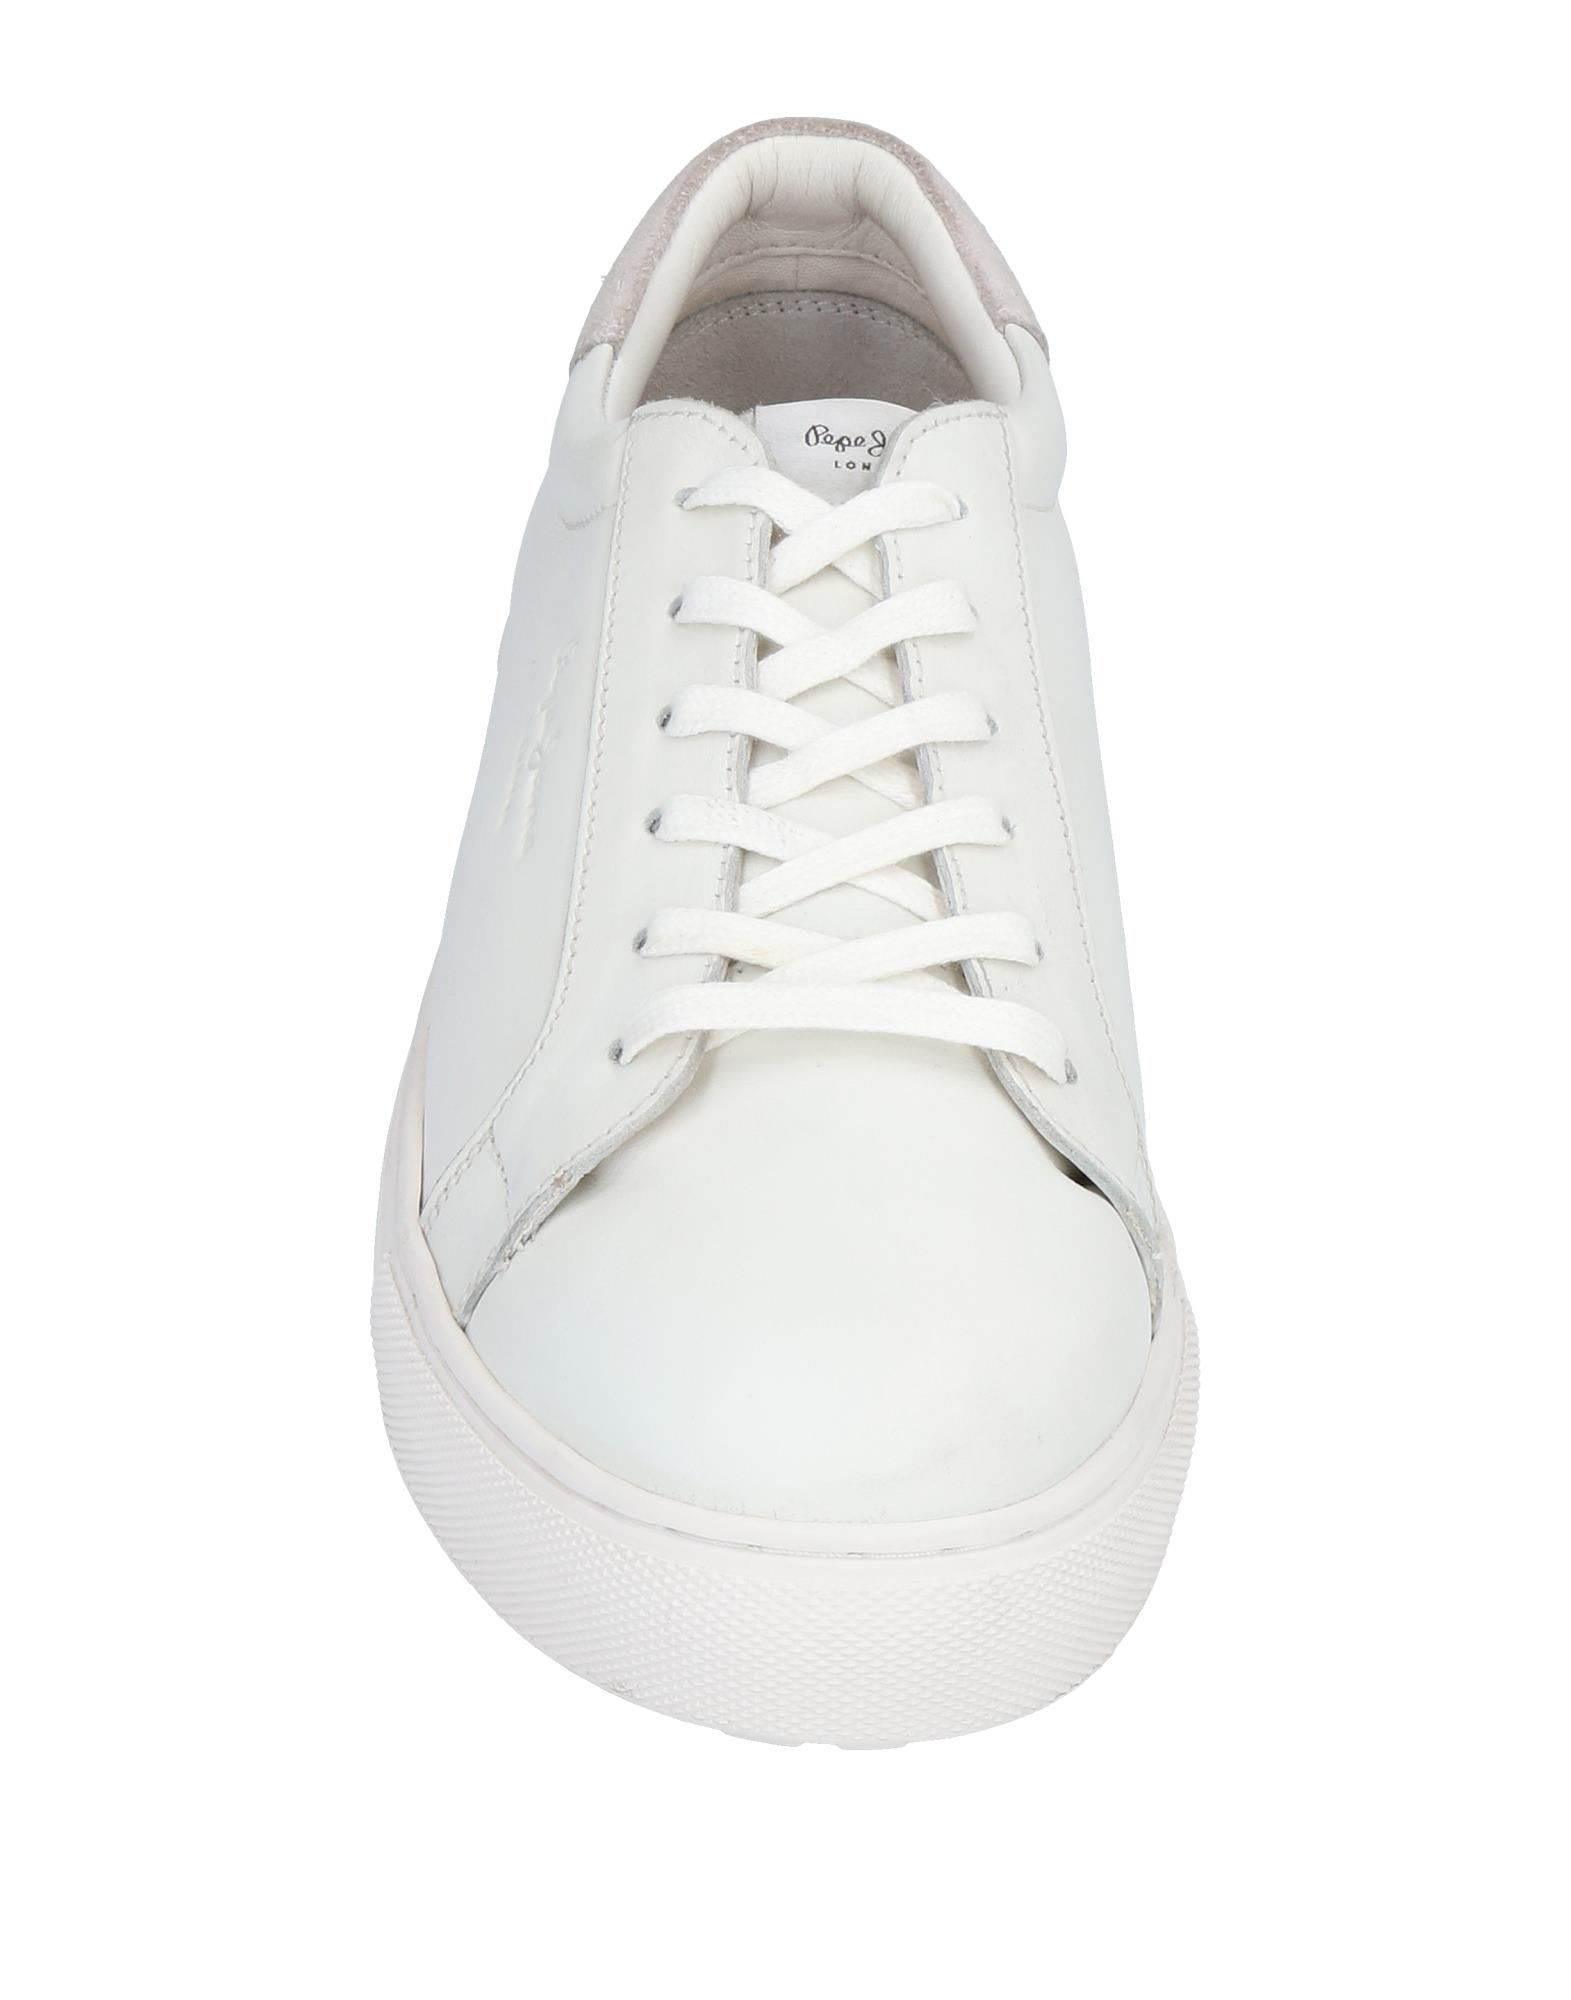 Pepe Jeans Sneakers 11479554QF Herren  11479554QF Sneakers Neue Schuhe ebf5bc